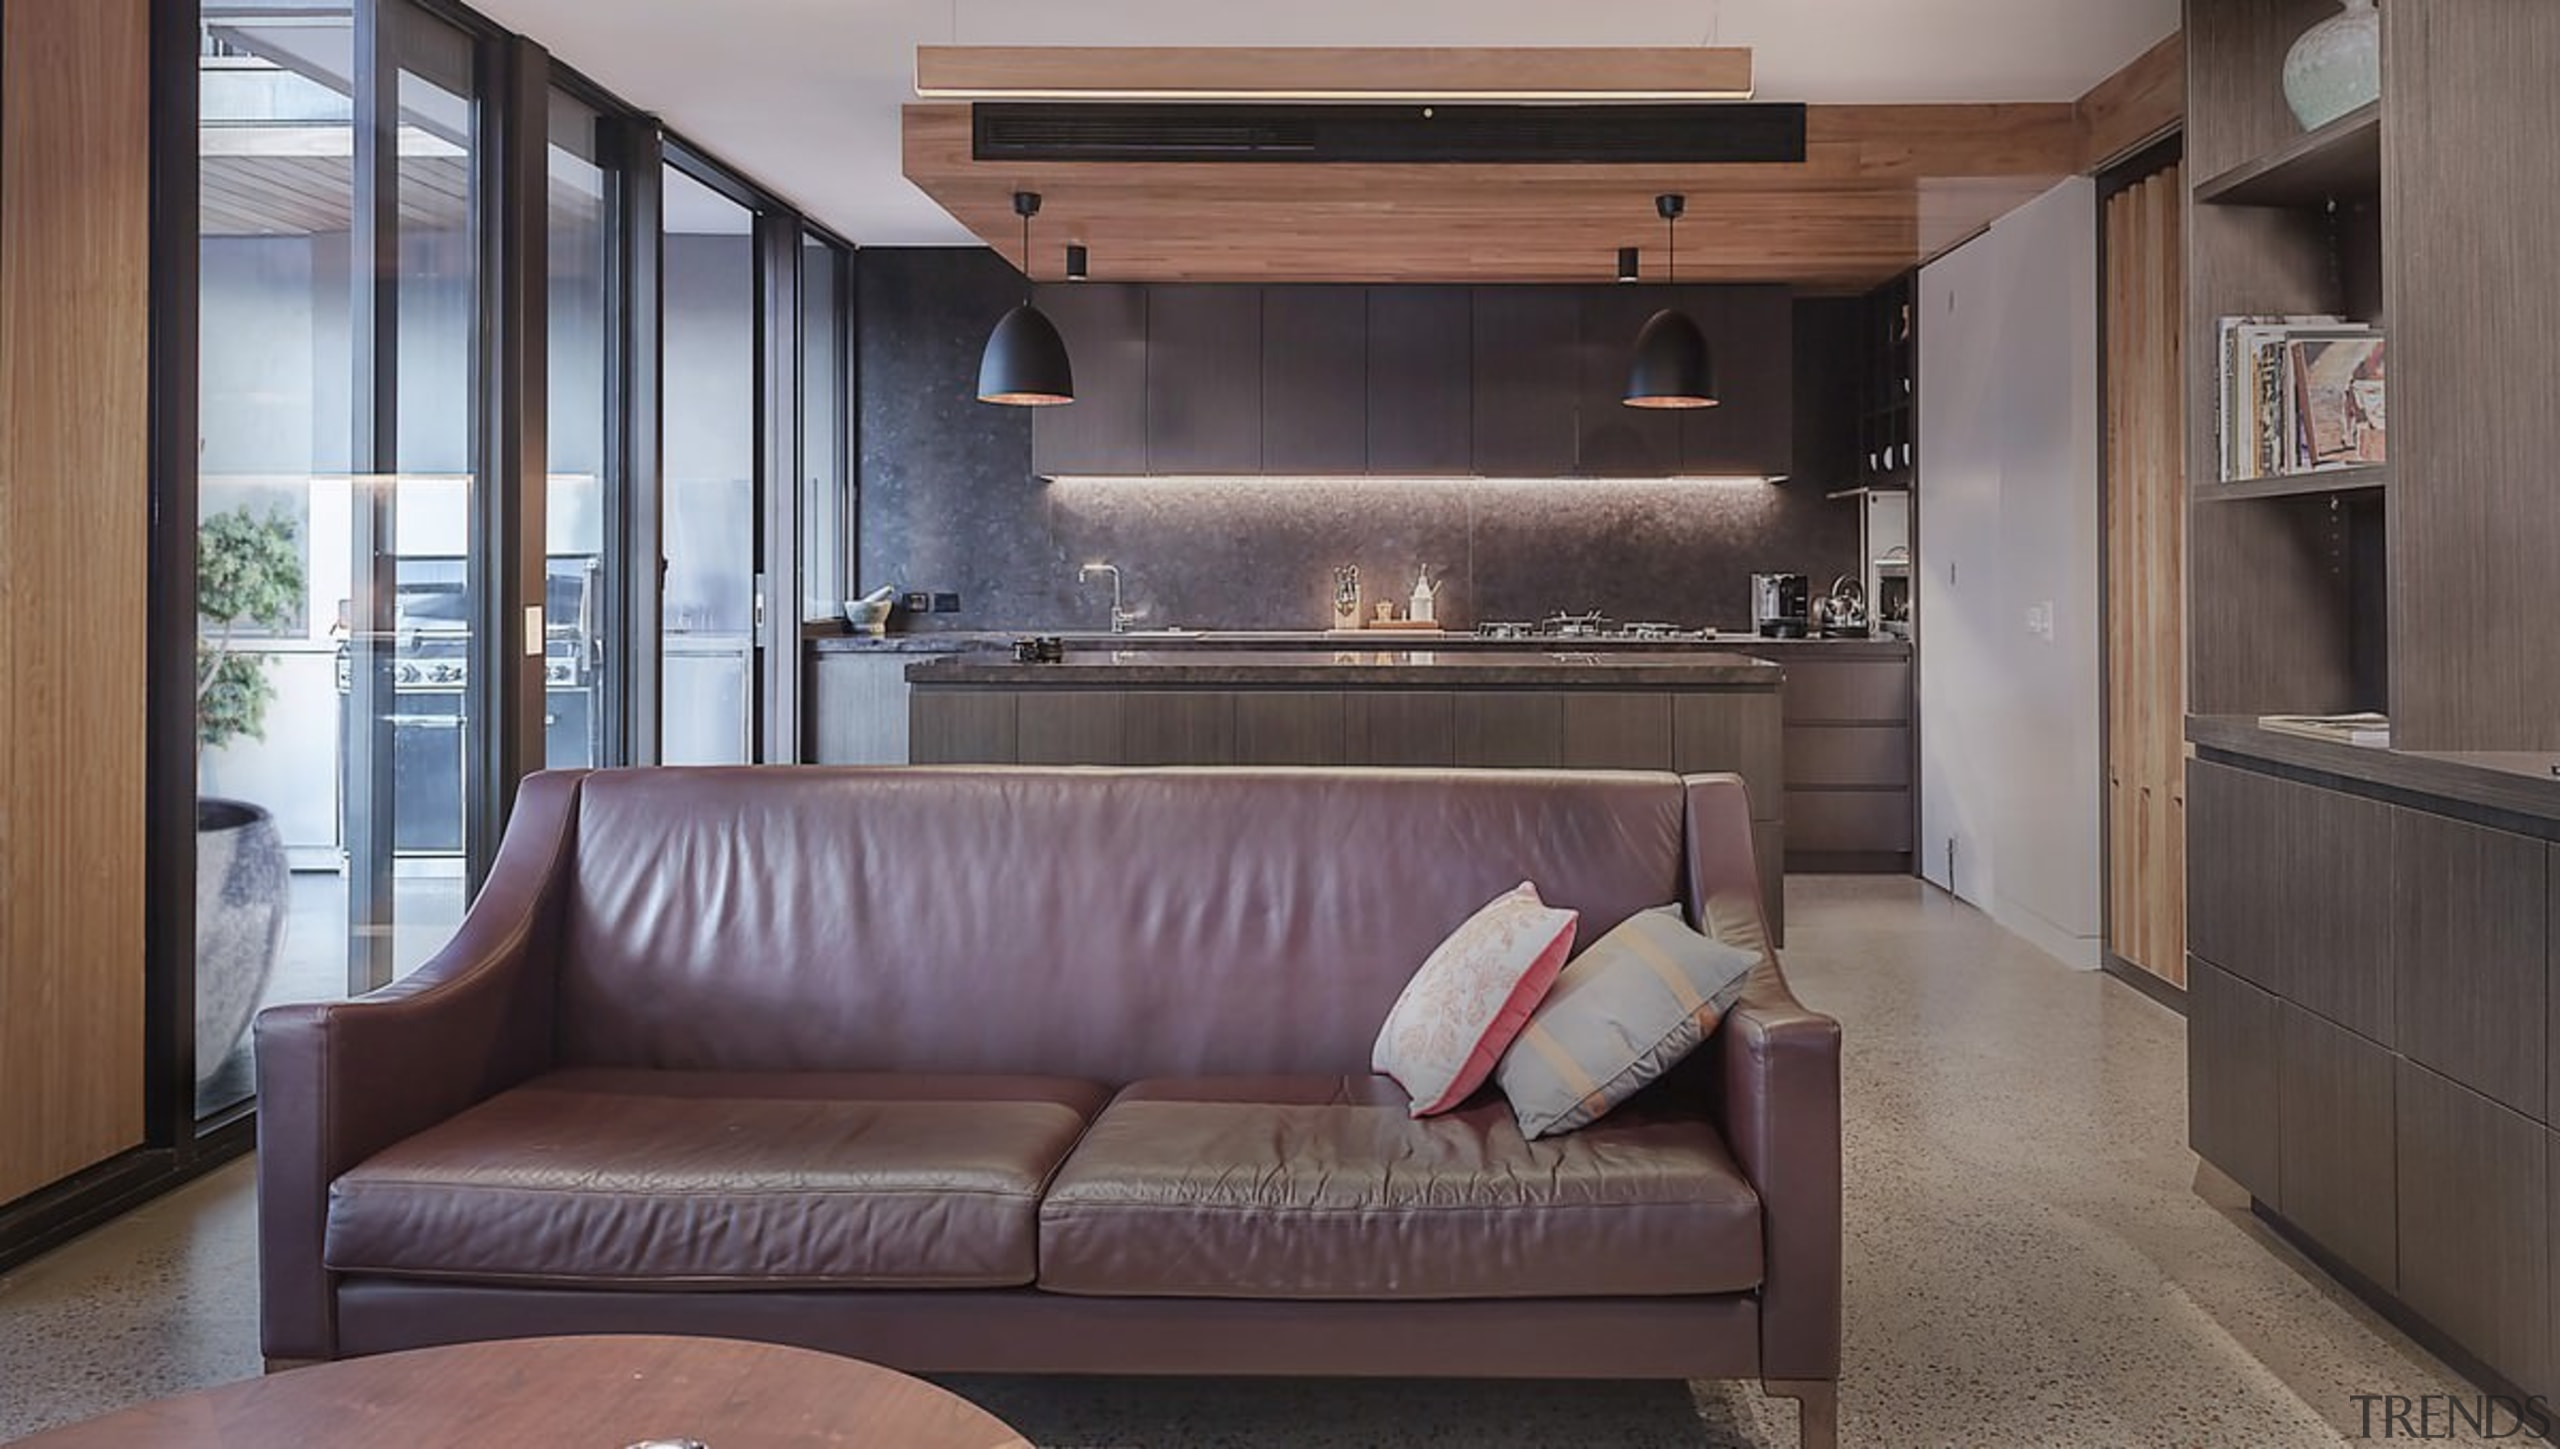 Architect: mcmahon and nerlich architectsPhotography by superk interior design, gray, black